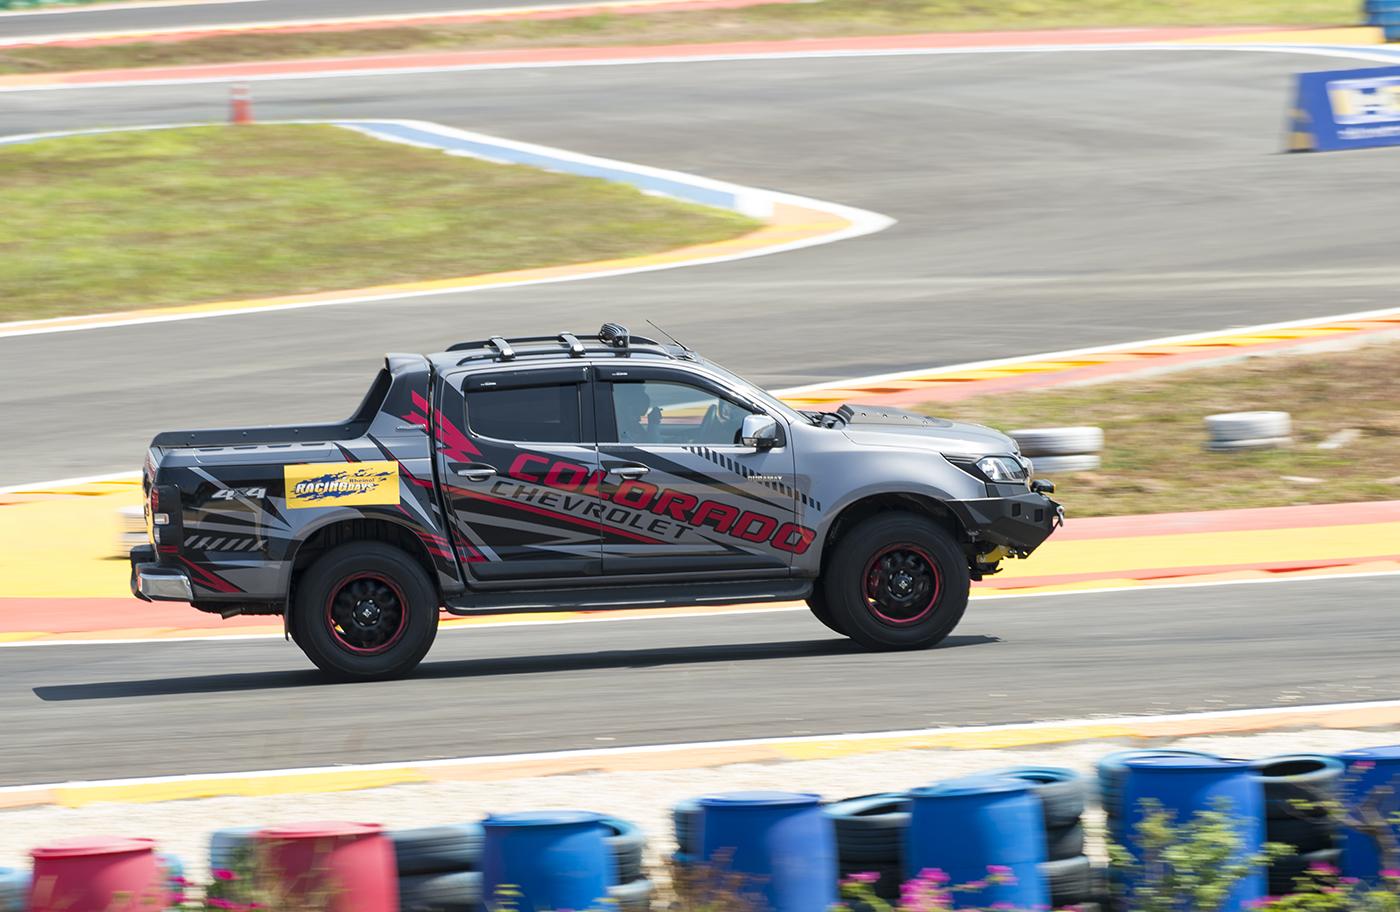 rheinol-racing-days-autodaily-0-15.jpg